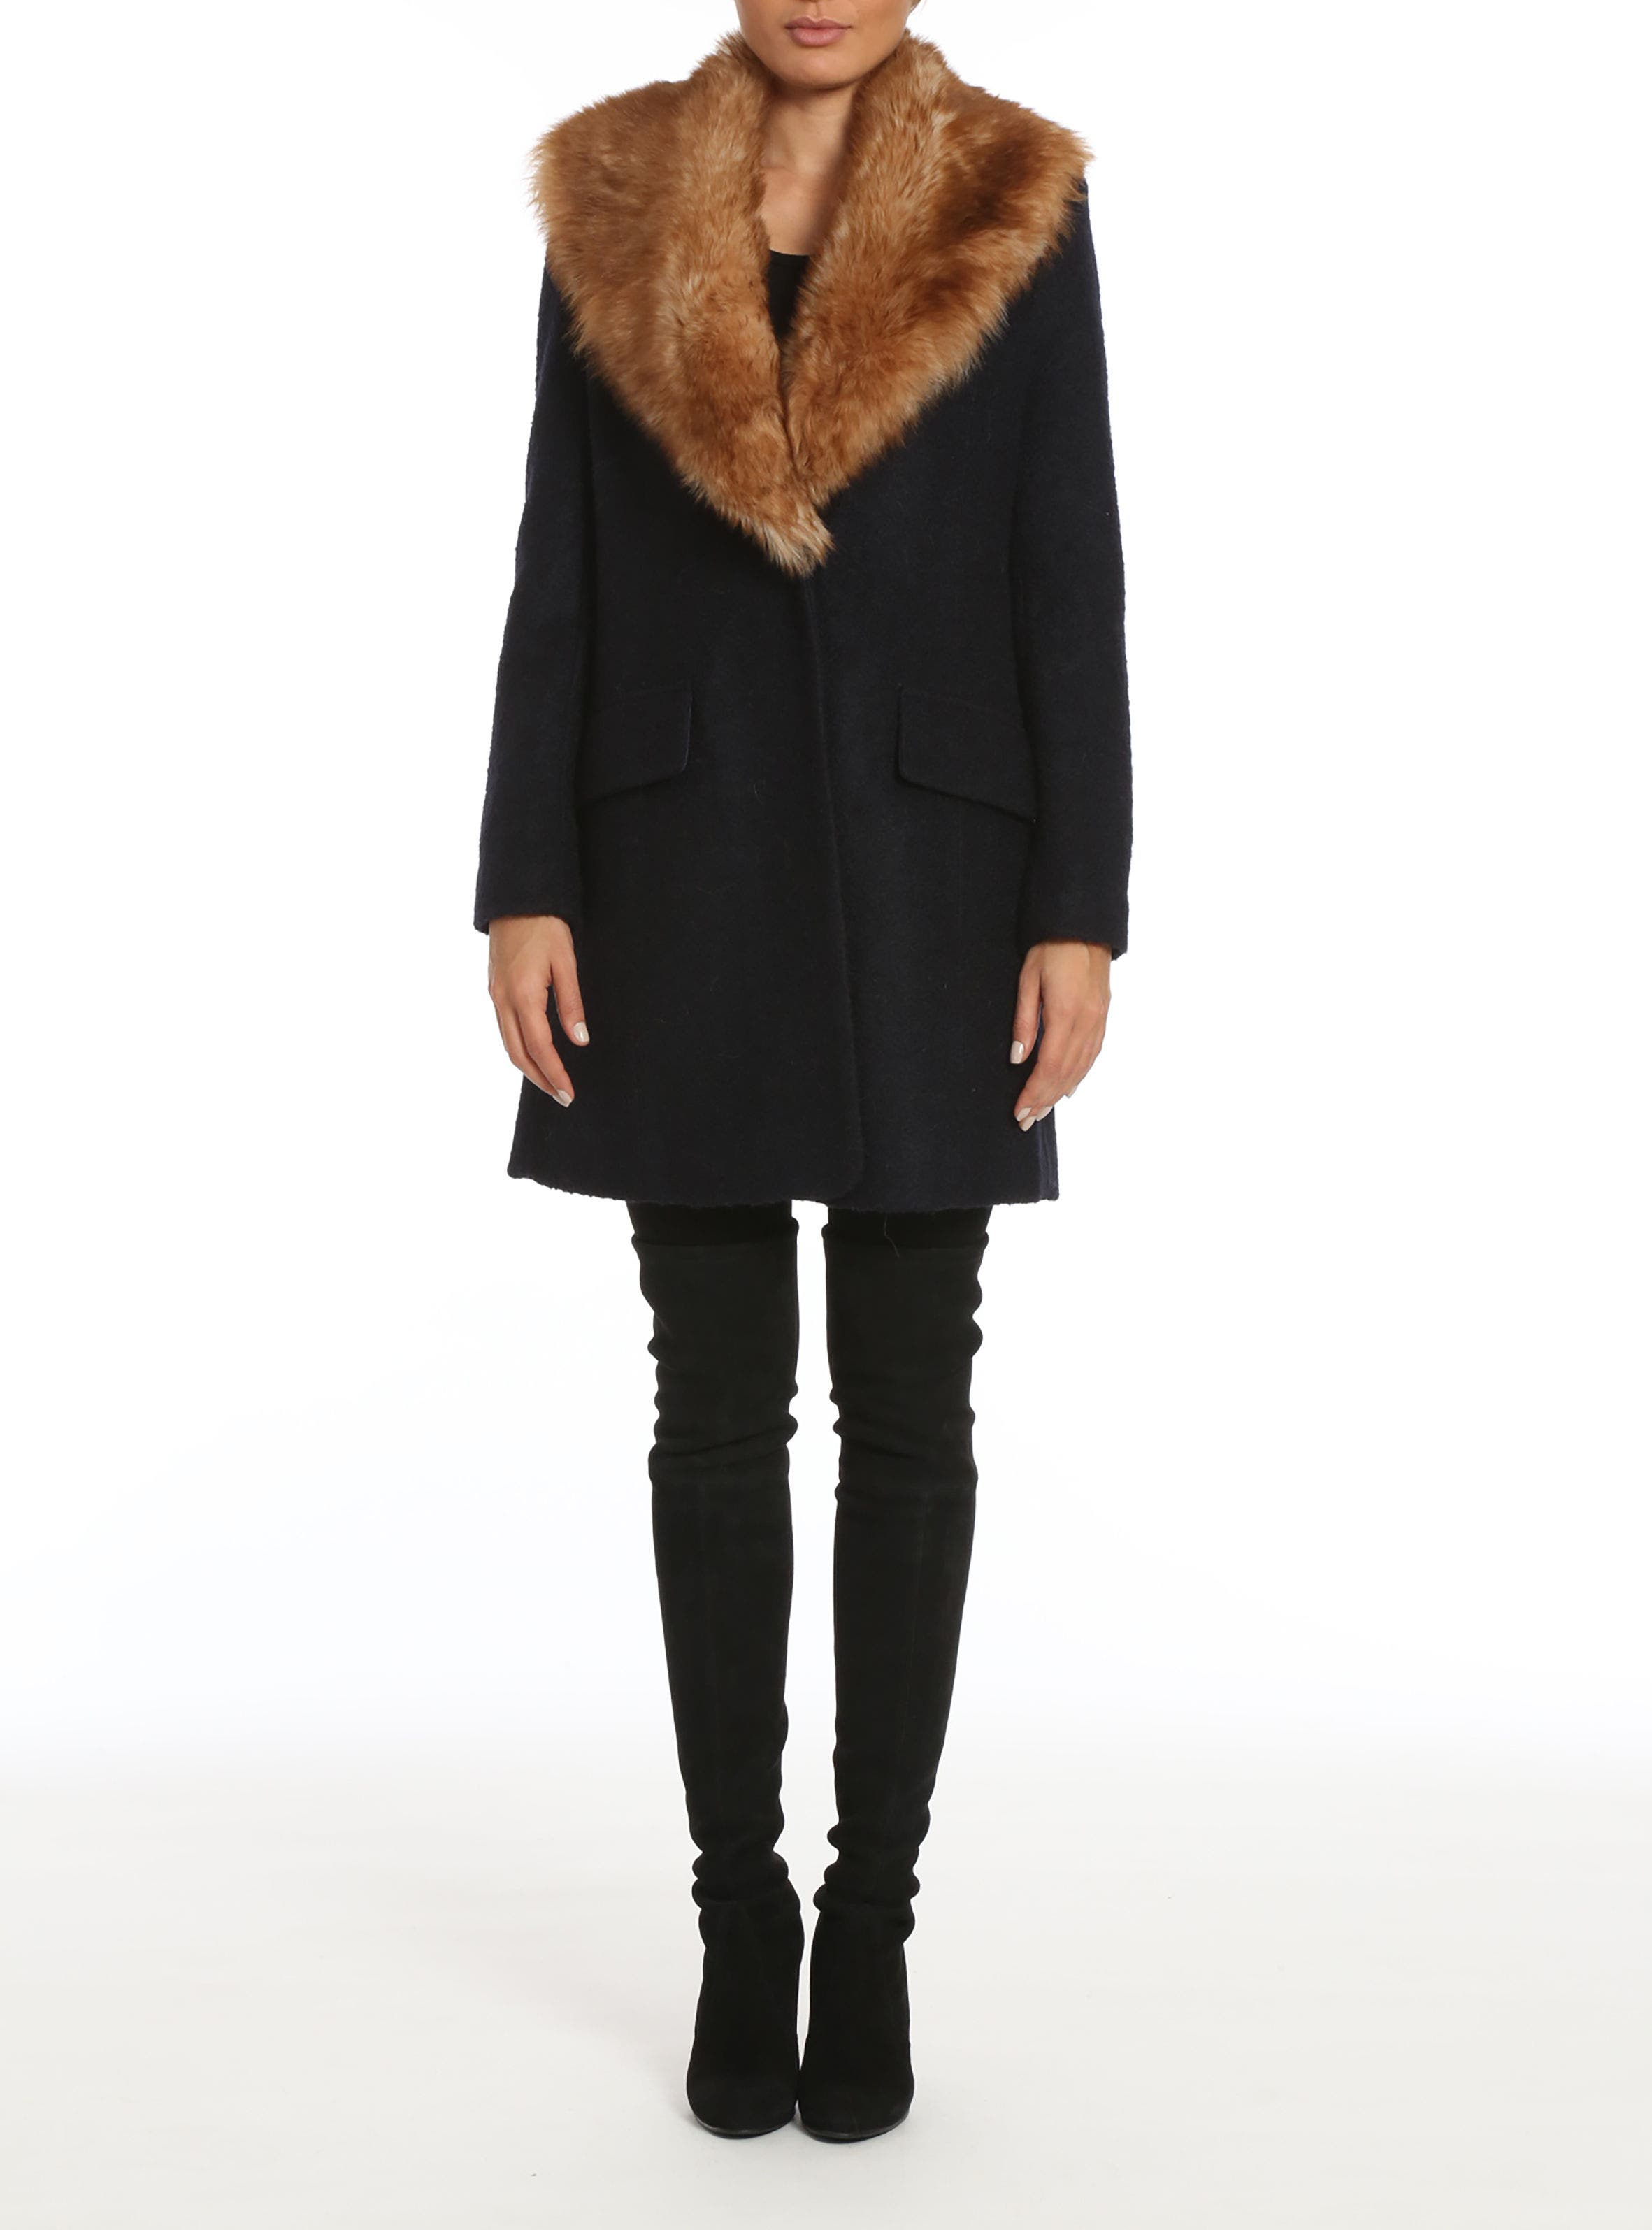 Alternate Image 1 Selected - Belle Badgley Mischka 'Holly' Faux Fur Collar Bouclé Coat